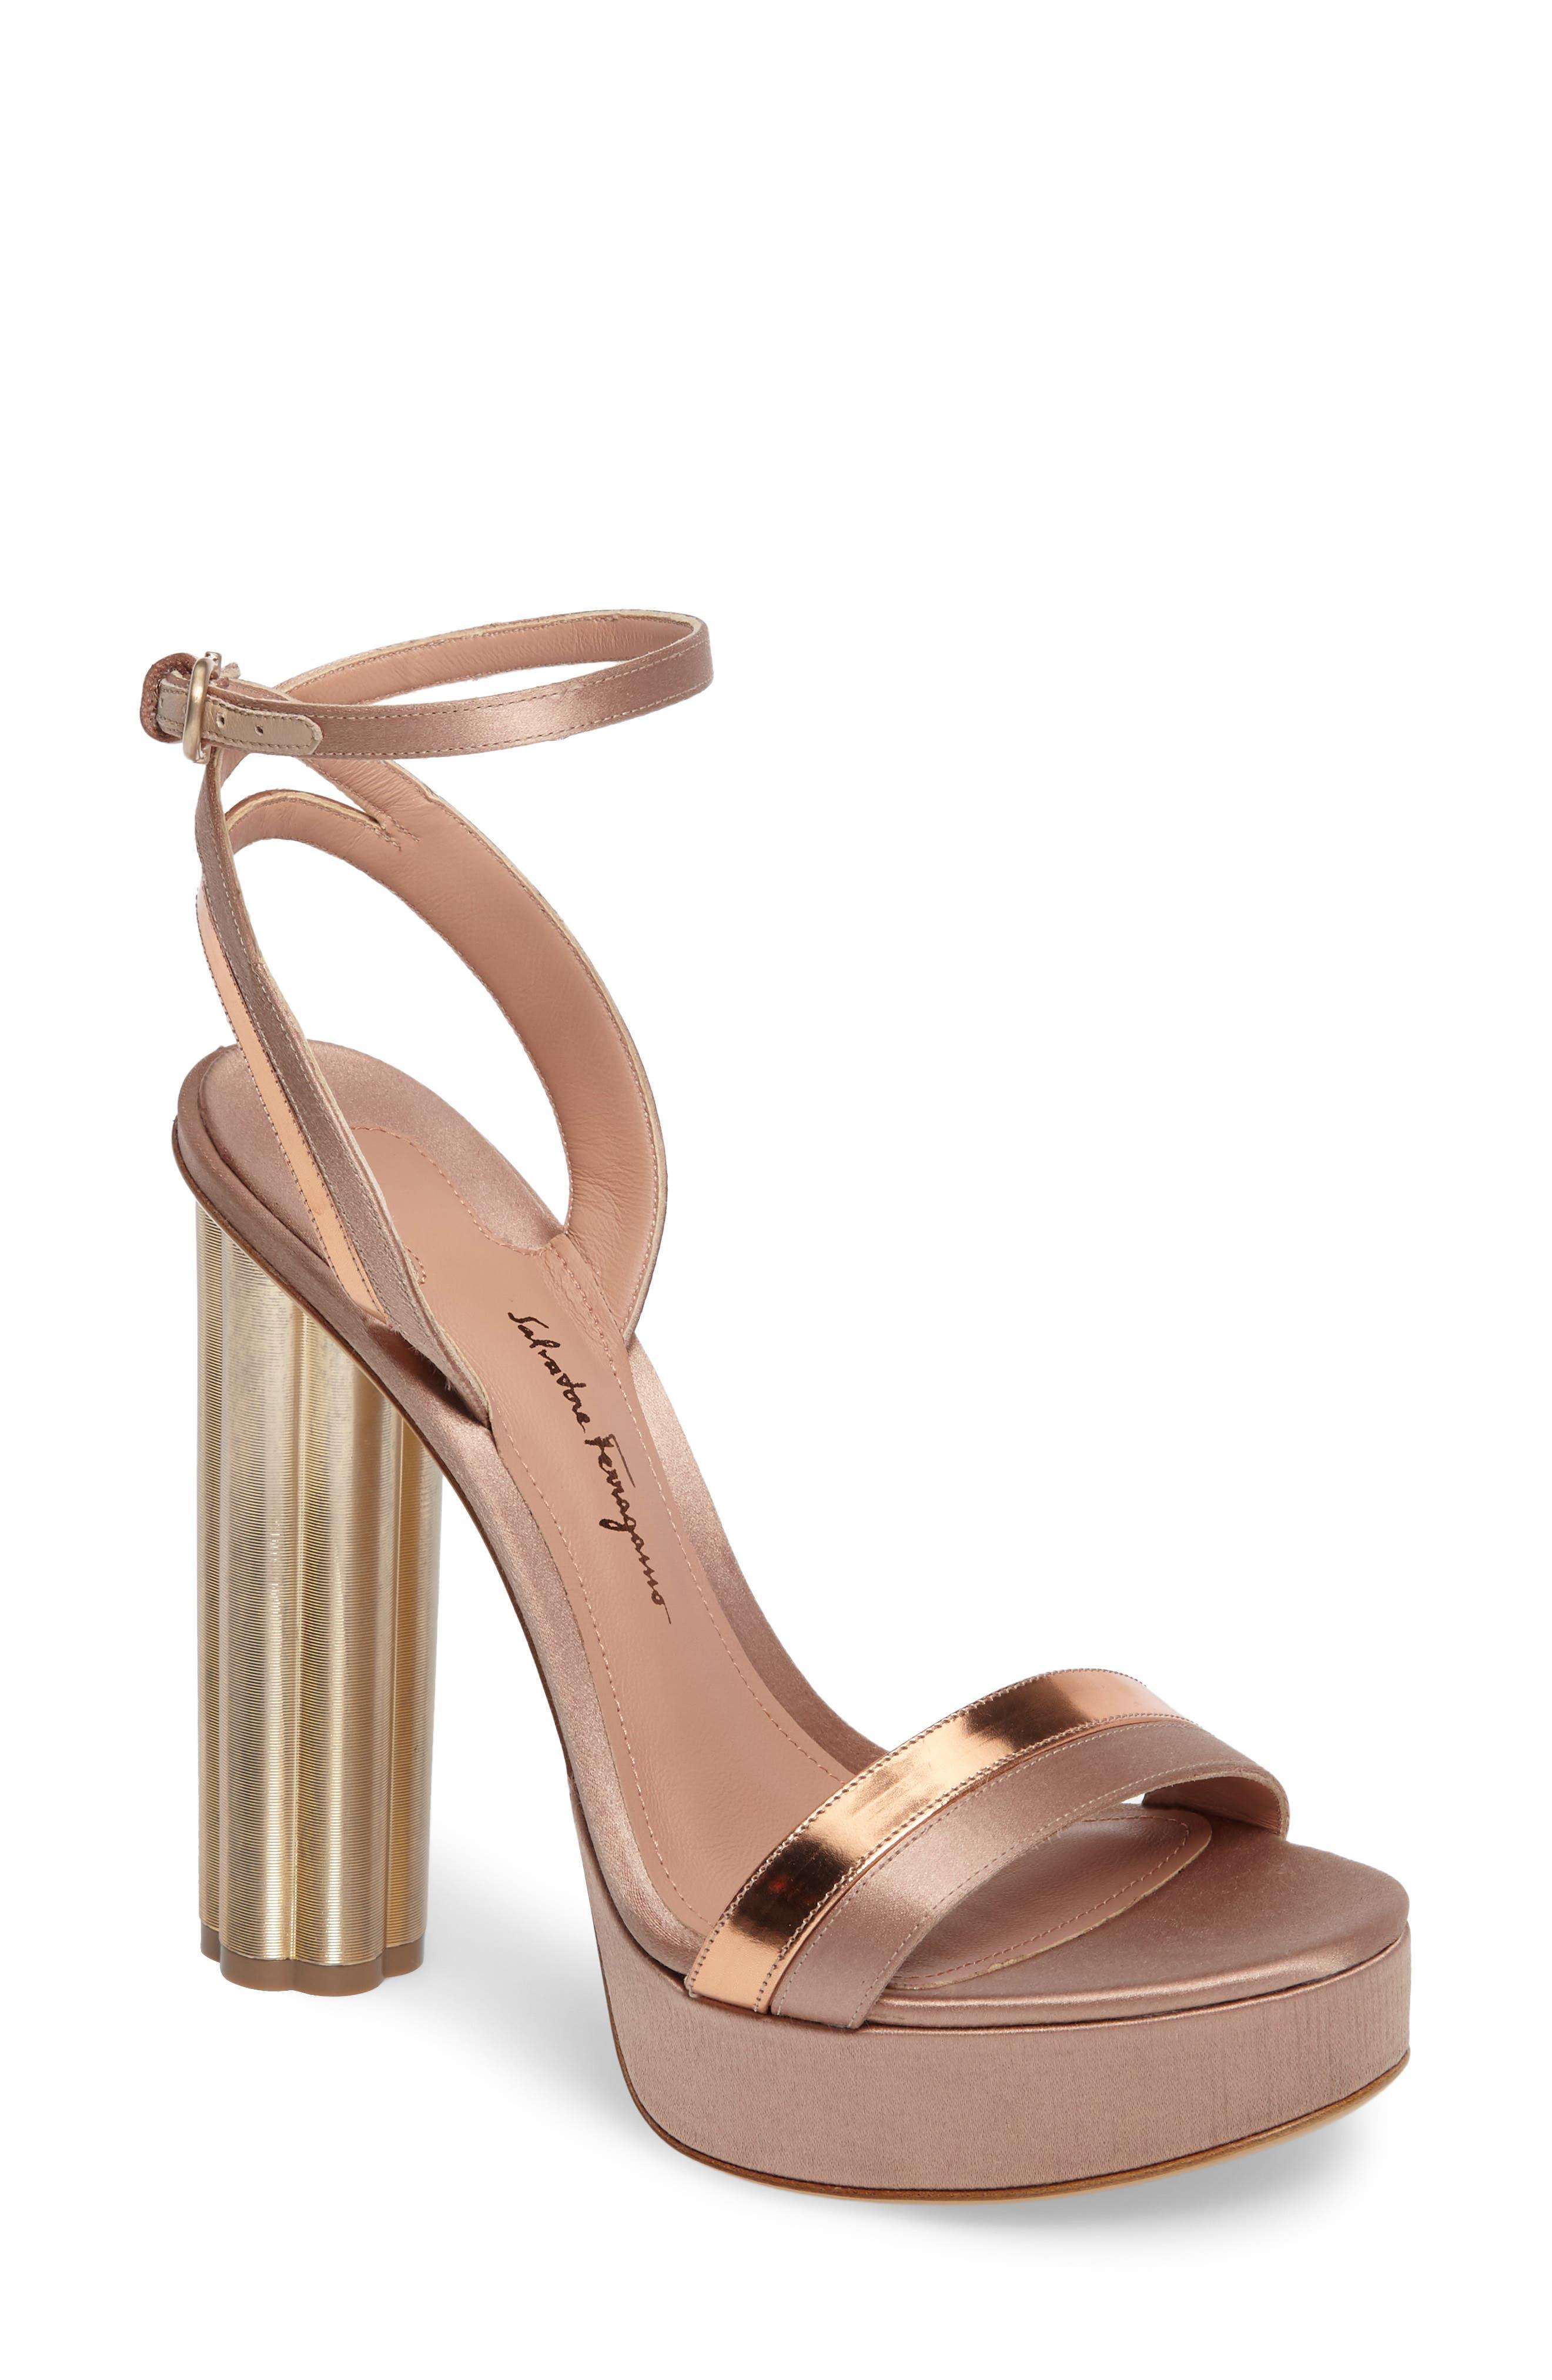 Main Image - Salvatore Ferragamo Ankle Strap Platform Sandal (Women)